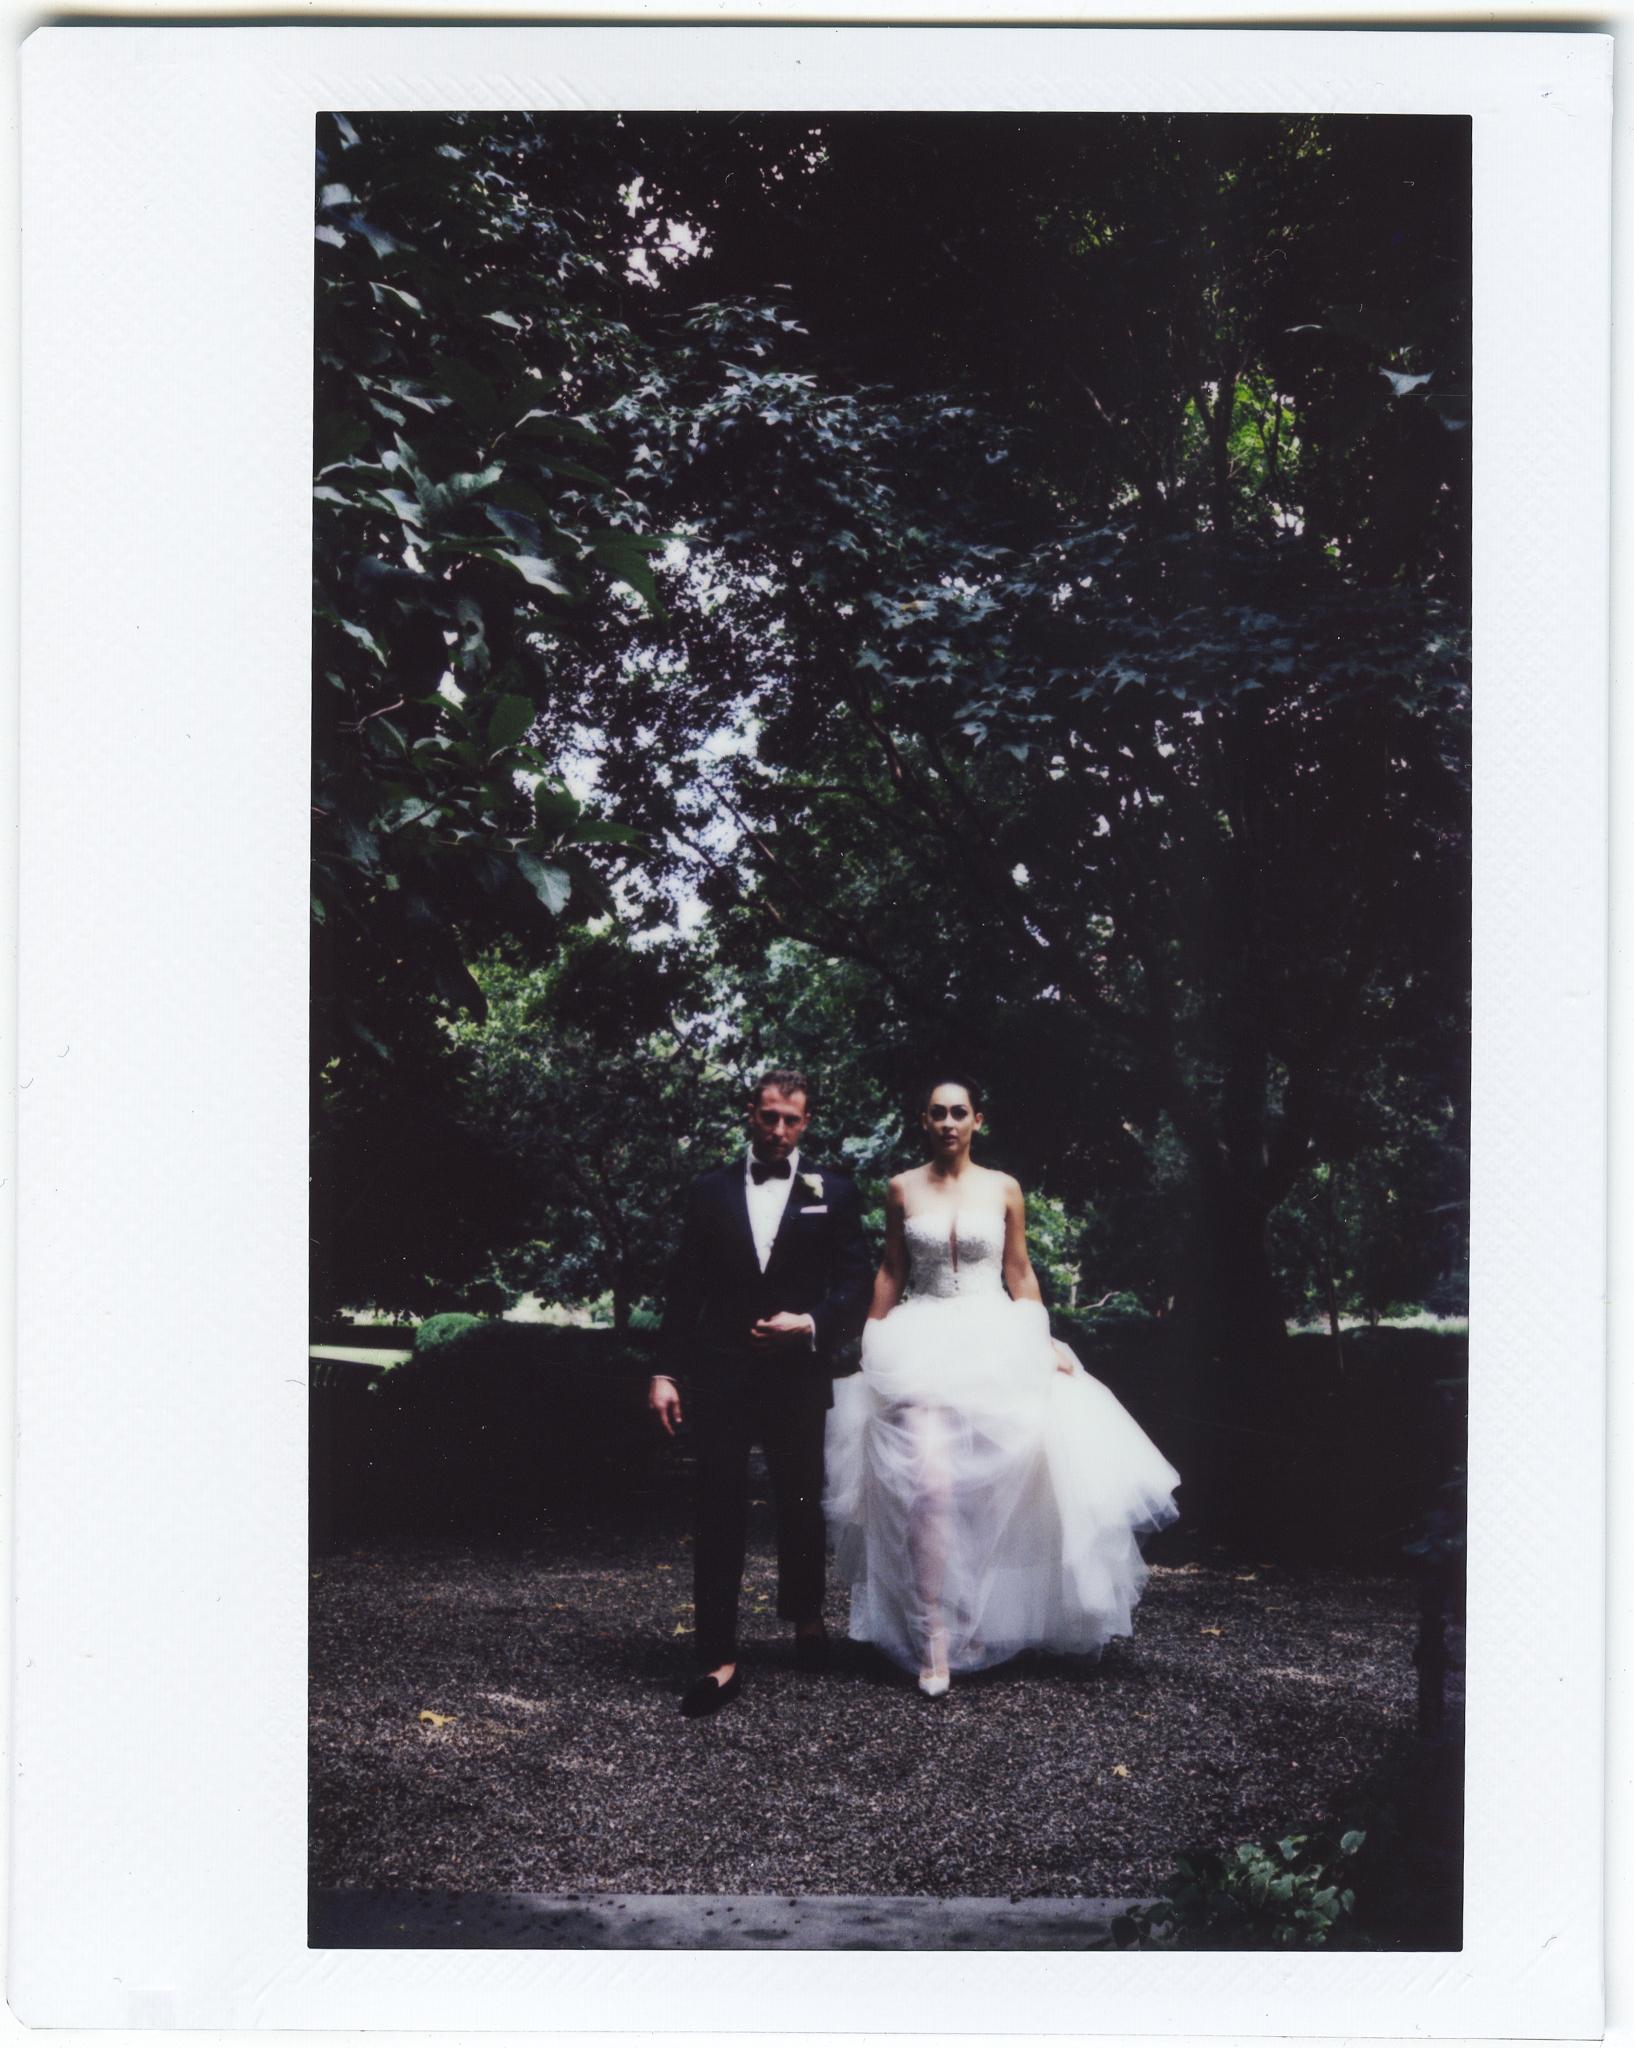 gramercy park hotel wedding polaroid instax